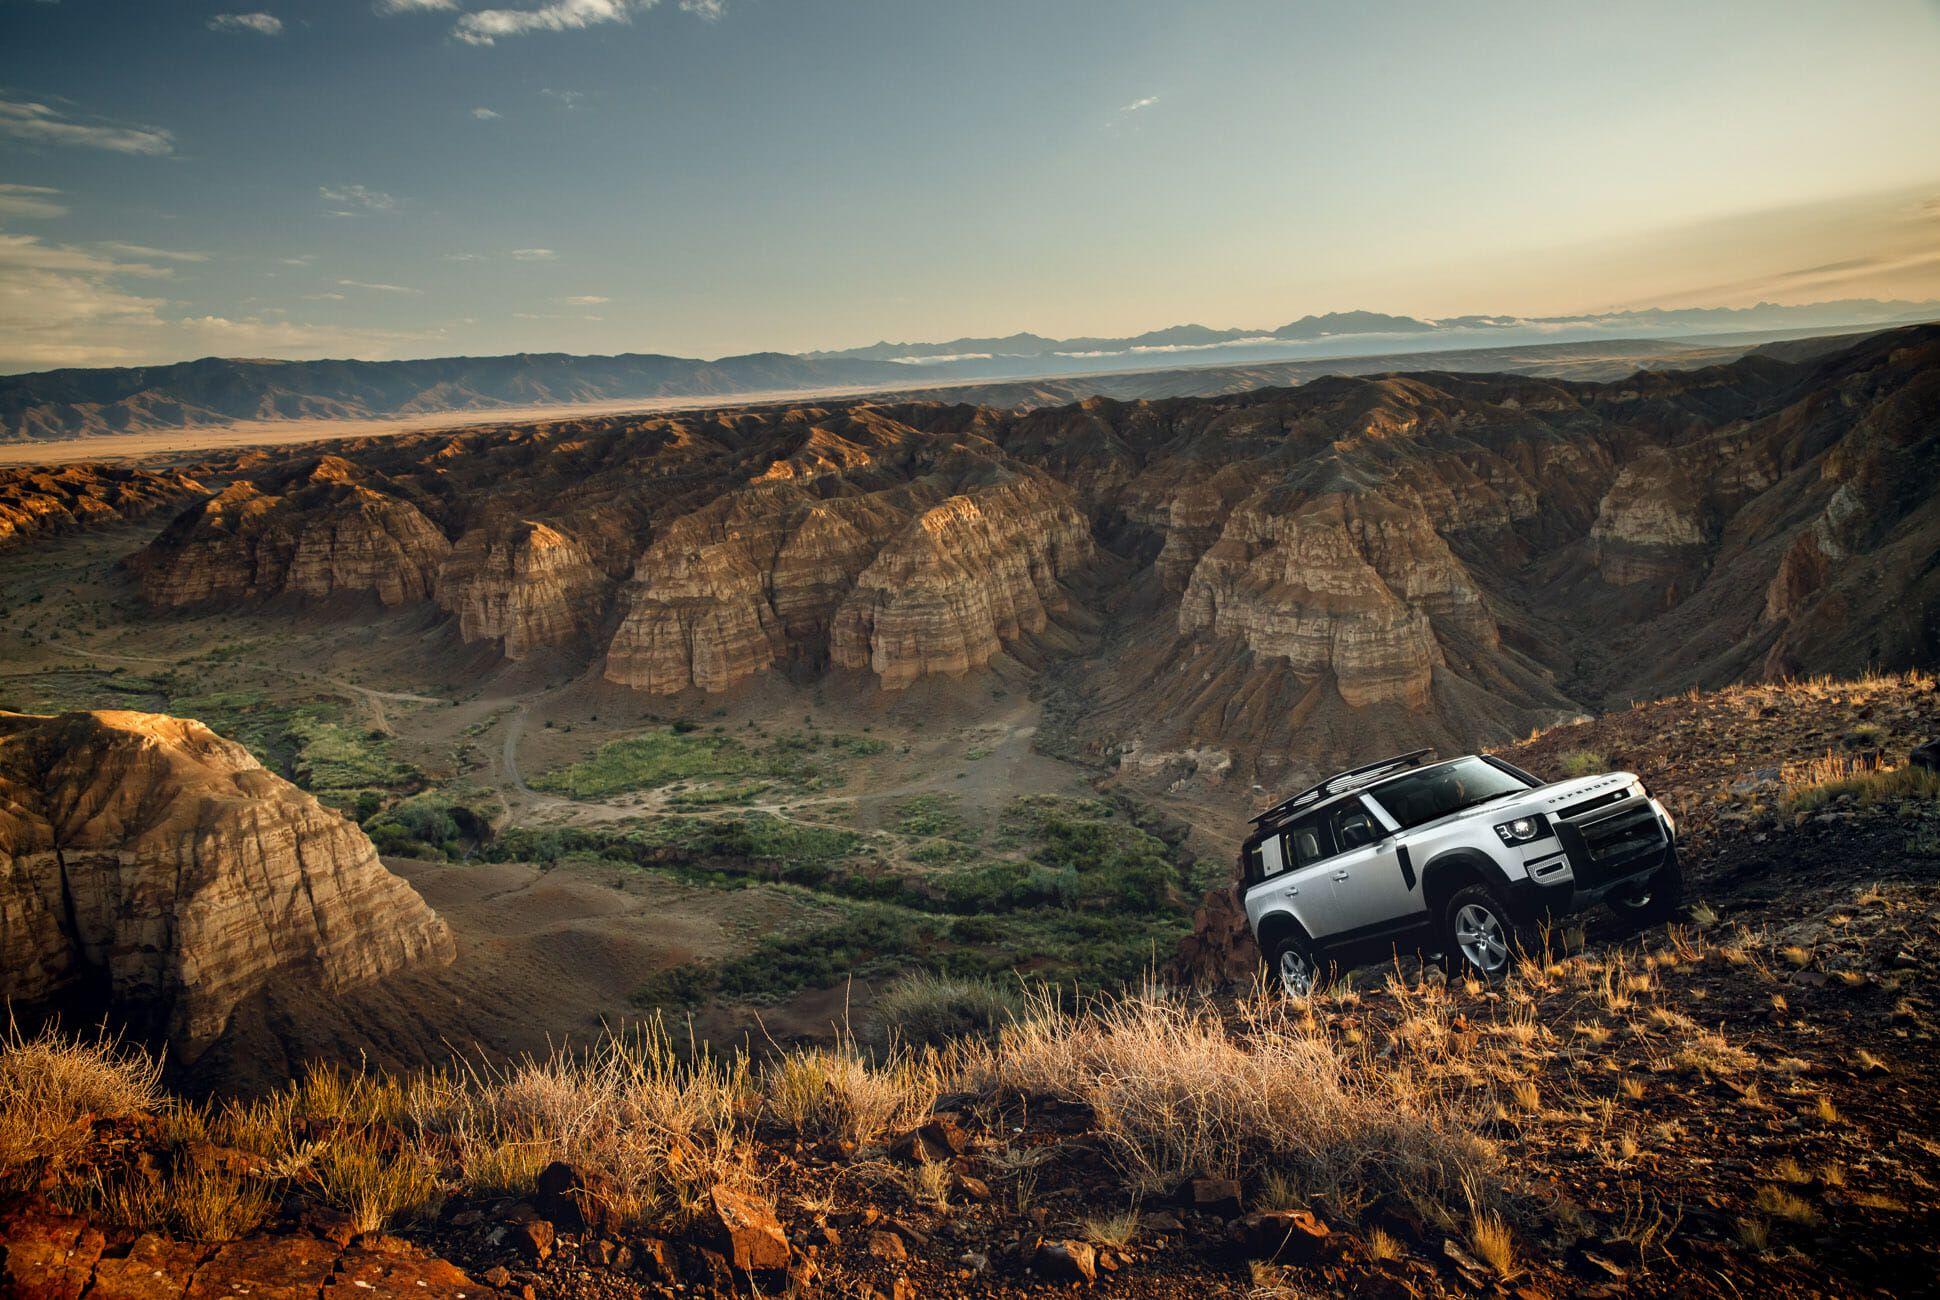 Land Rover Defender Gear Patrol-Exterior Action-Slide-16